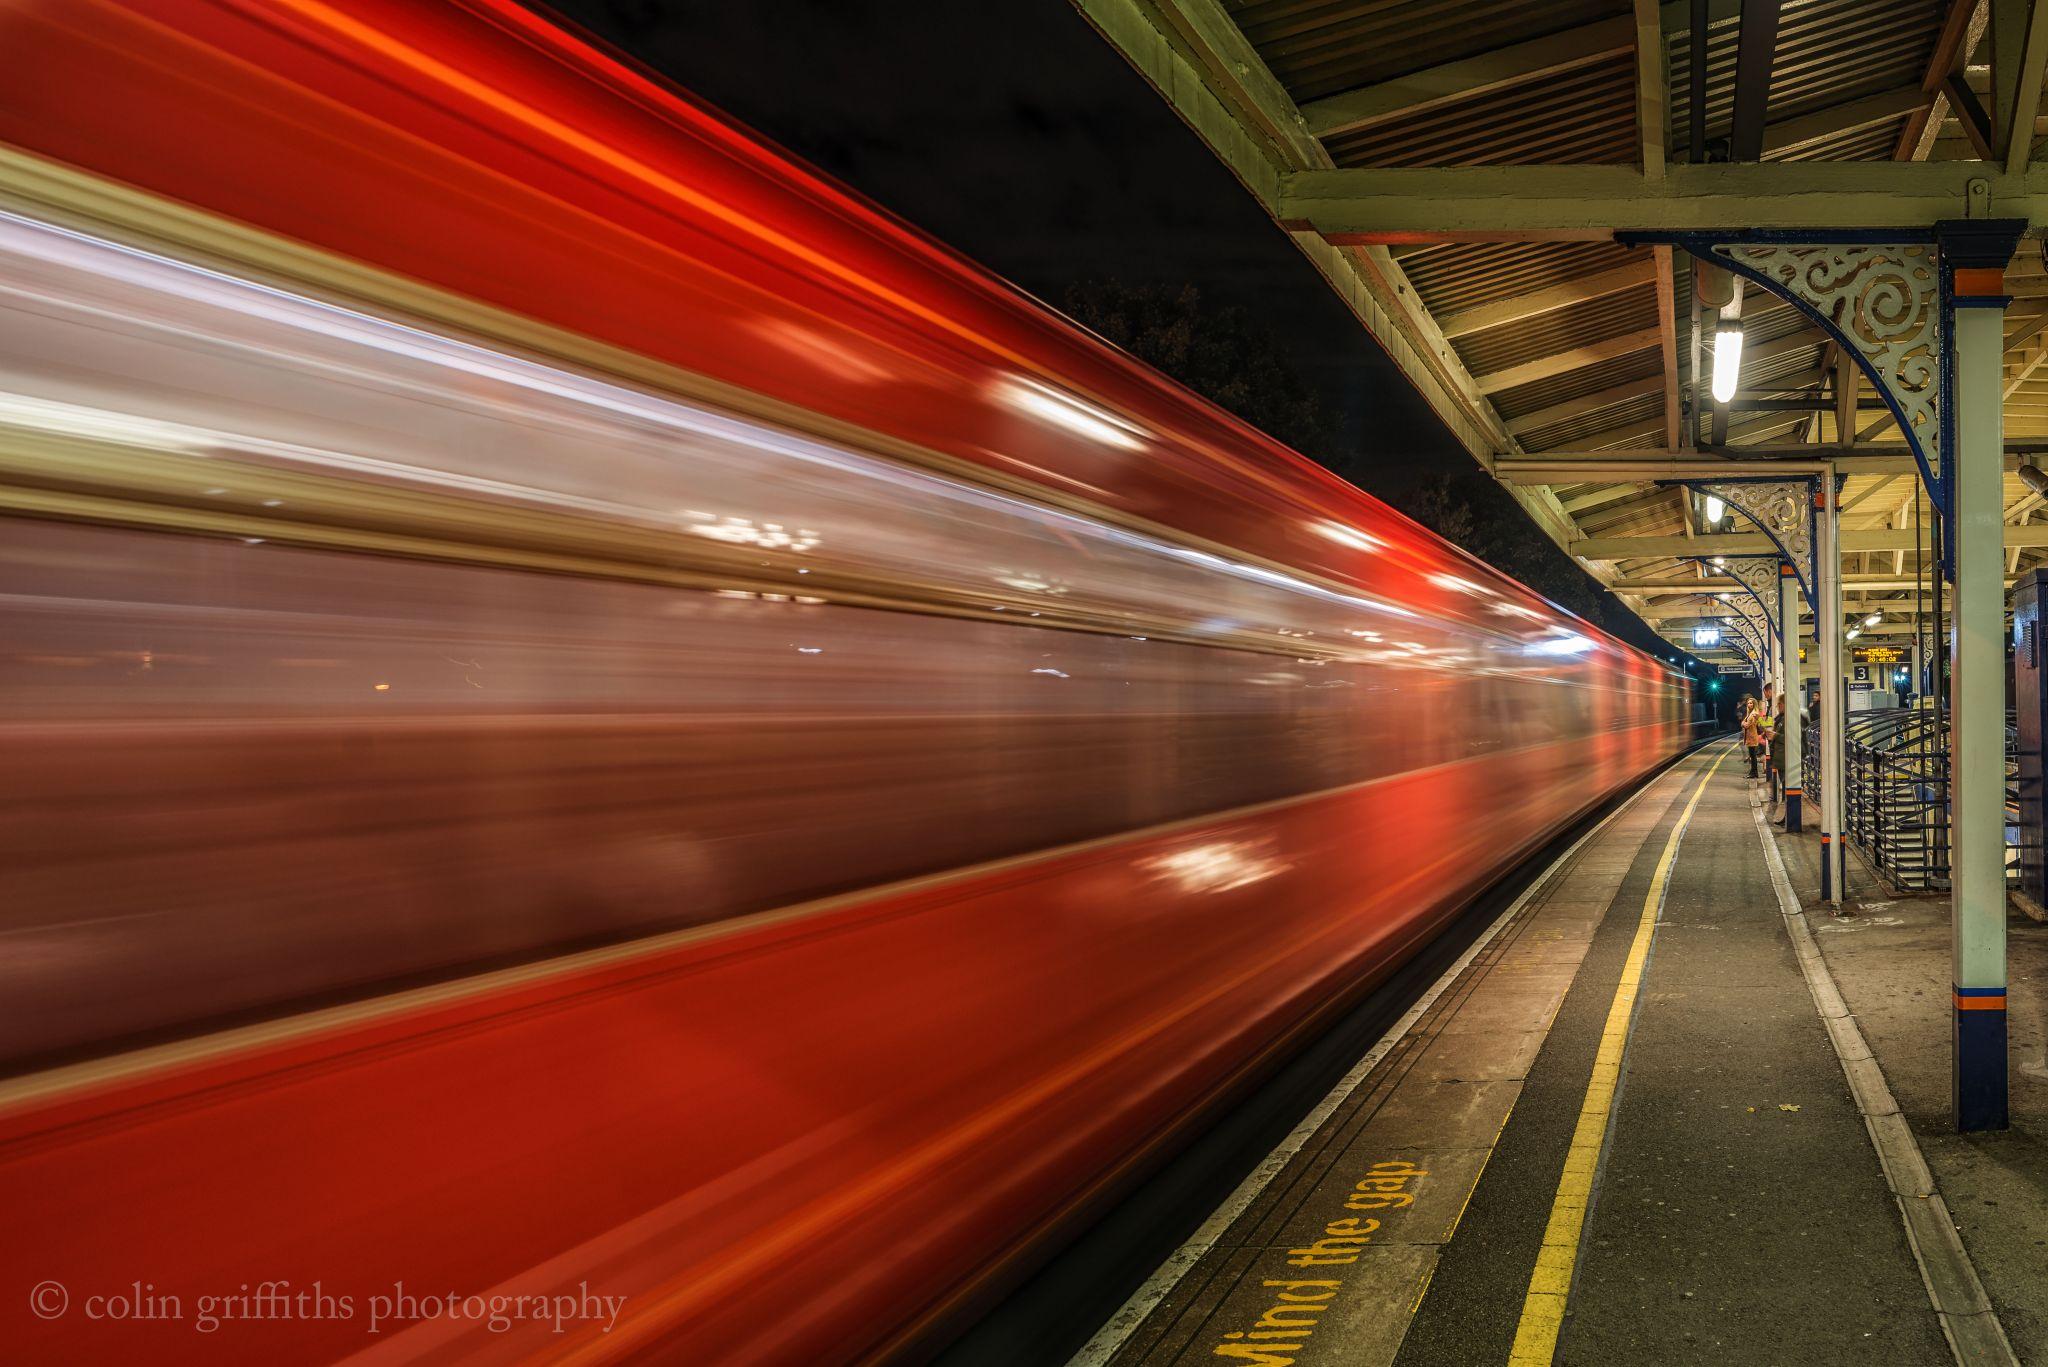 Wandsworth train station, United Kingdom